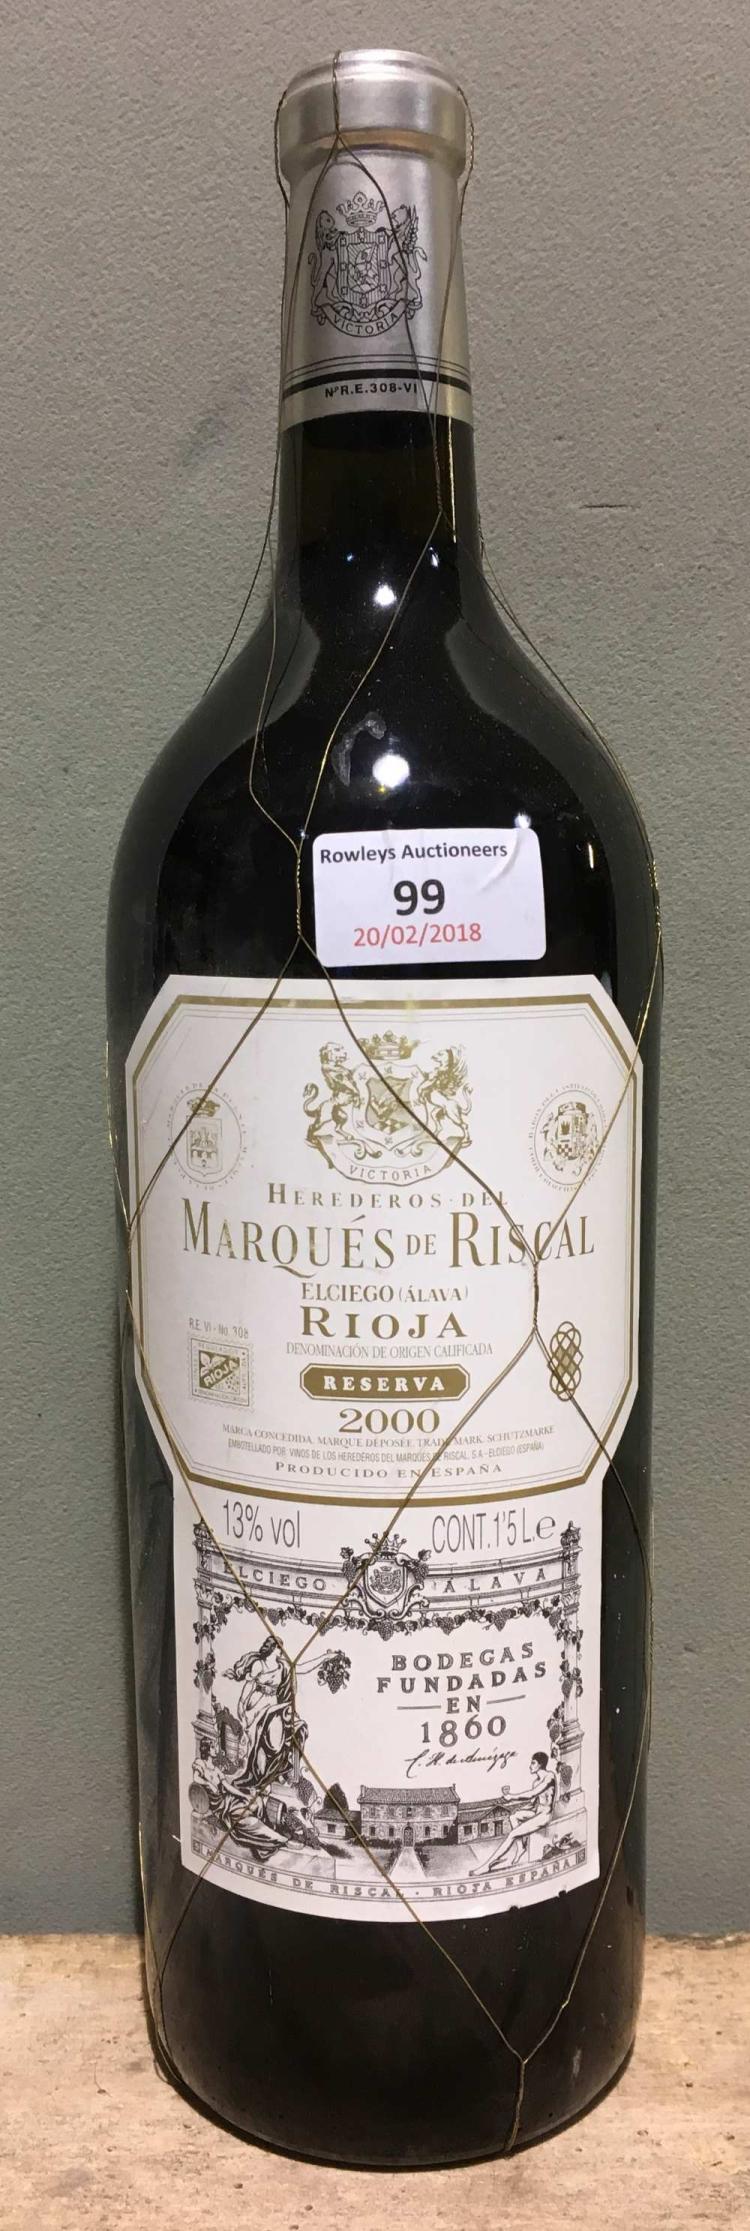 Marques de riscal rioja reserva 2000 single magnum for Marques de riscal rioja